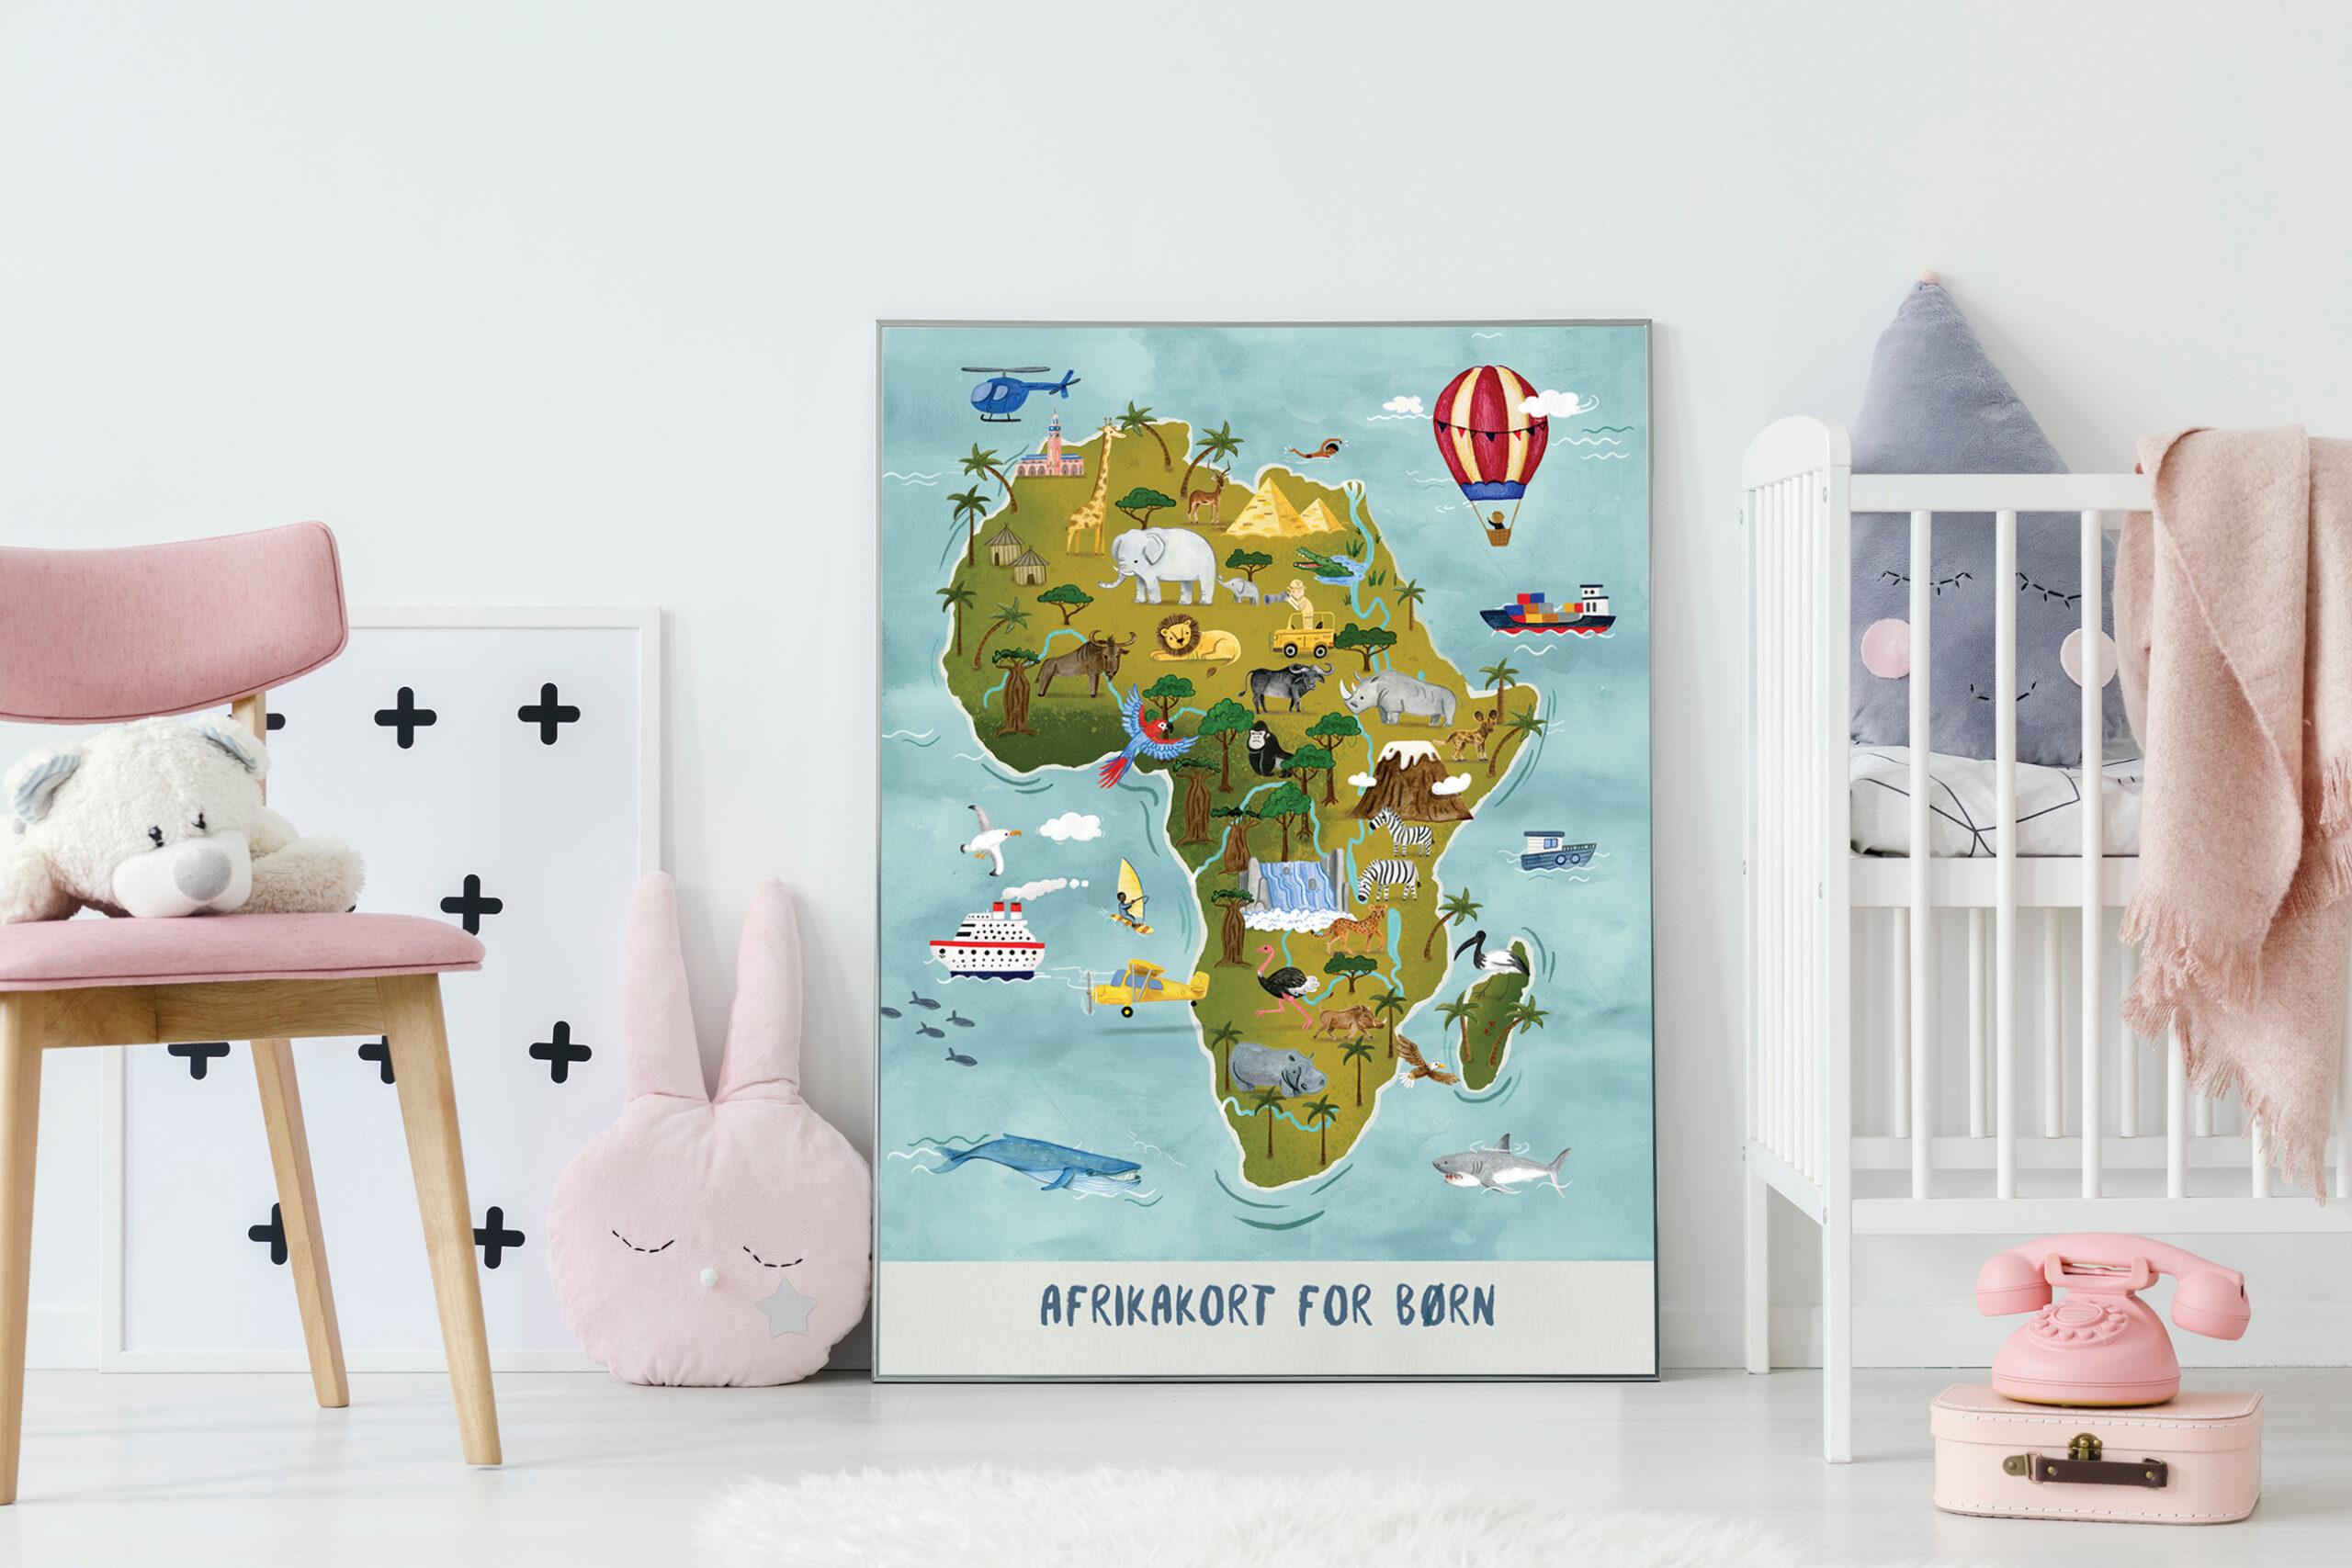 Afrikakort-for-boern-2